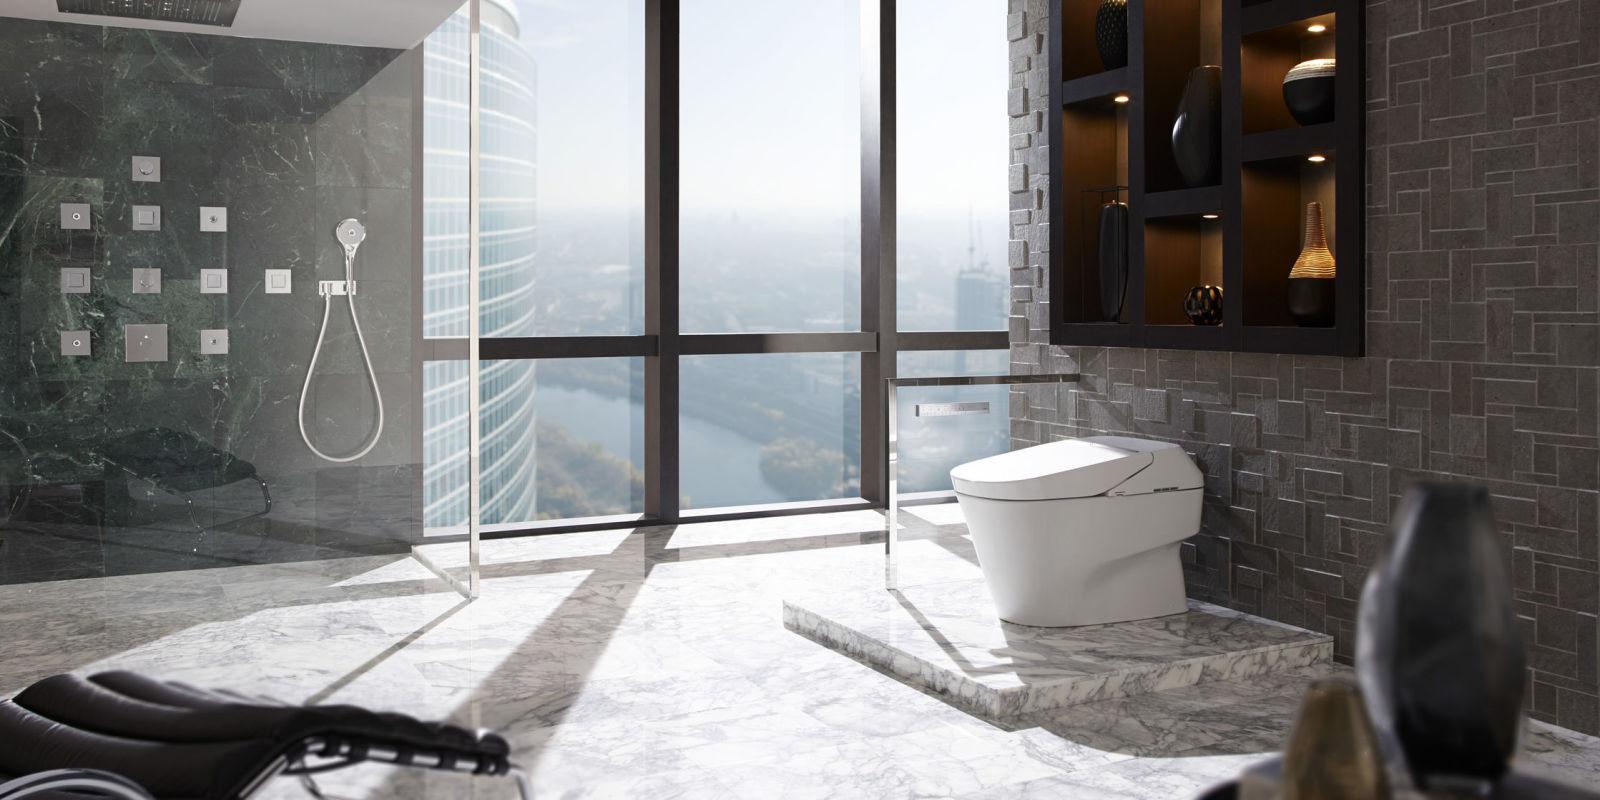 15 Dream Bathroom Inspiration  Photos of Beautiful Bathrooms